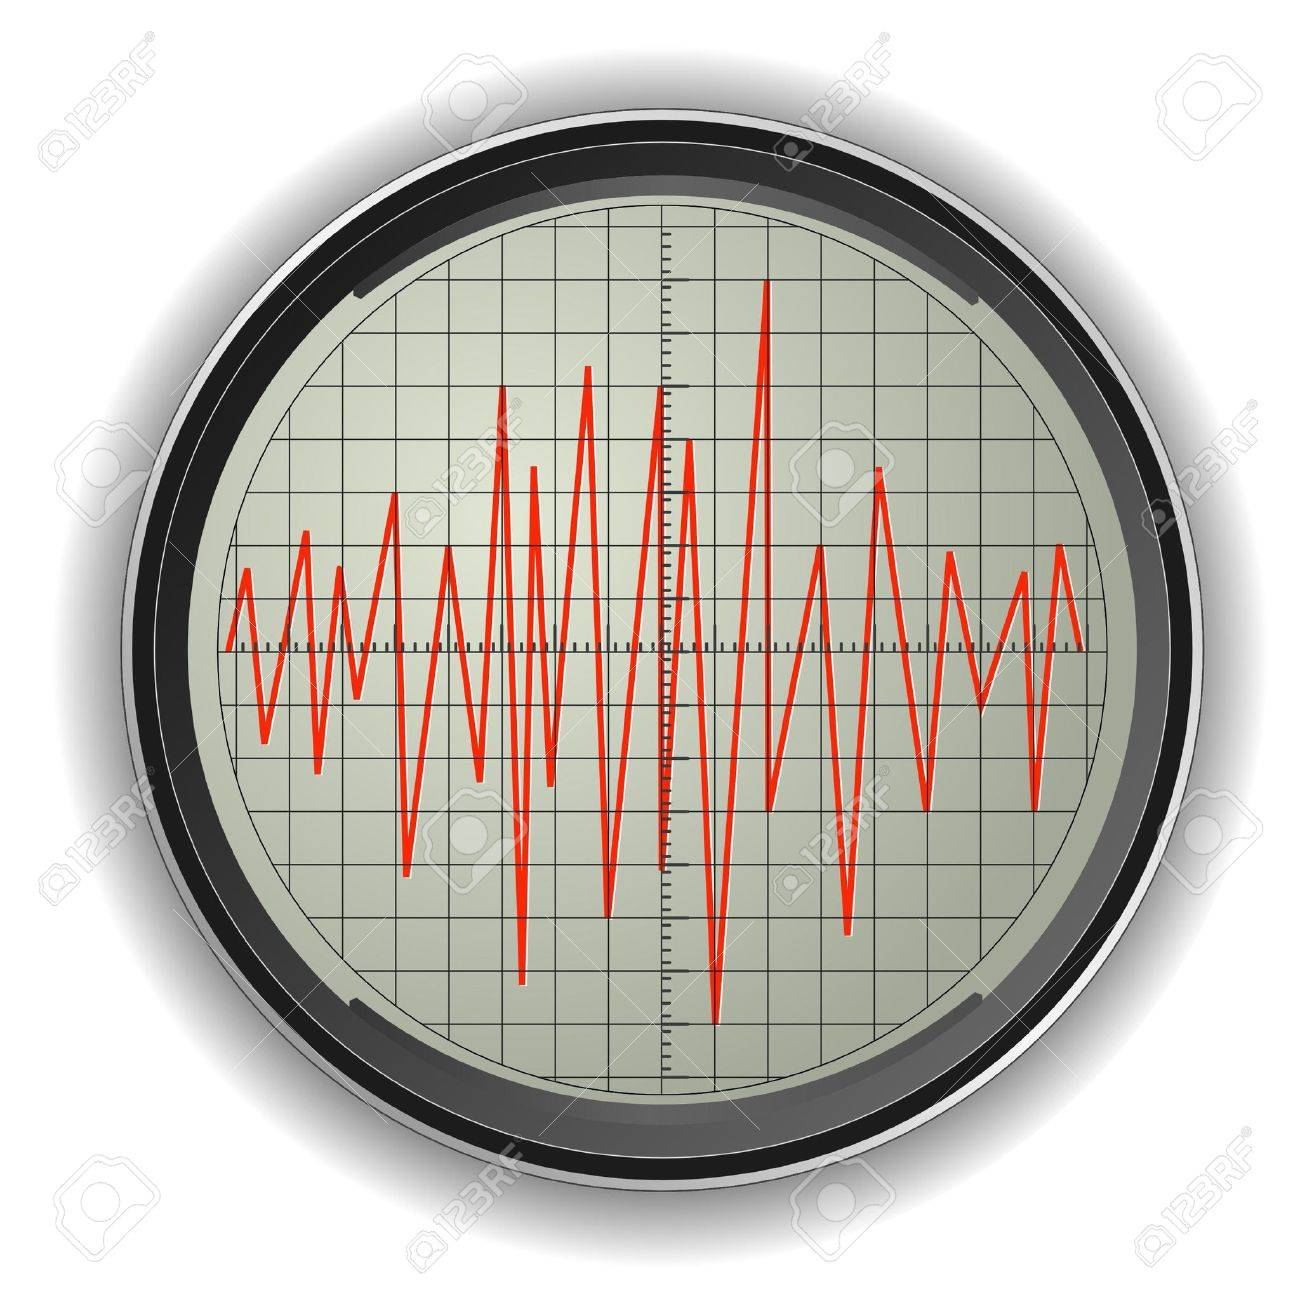 Vector illustration of an oscilloscope Stock Vector - 11942977